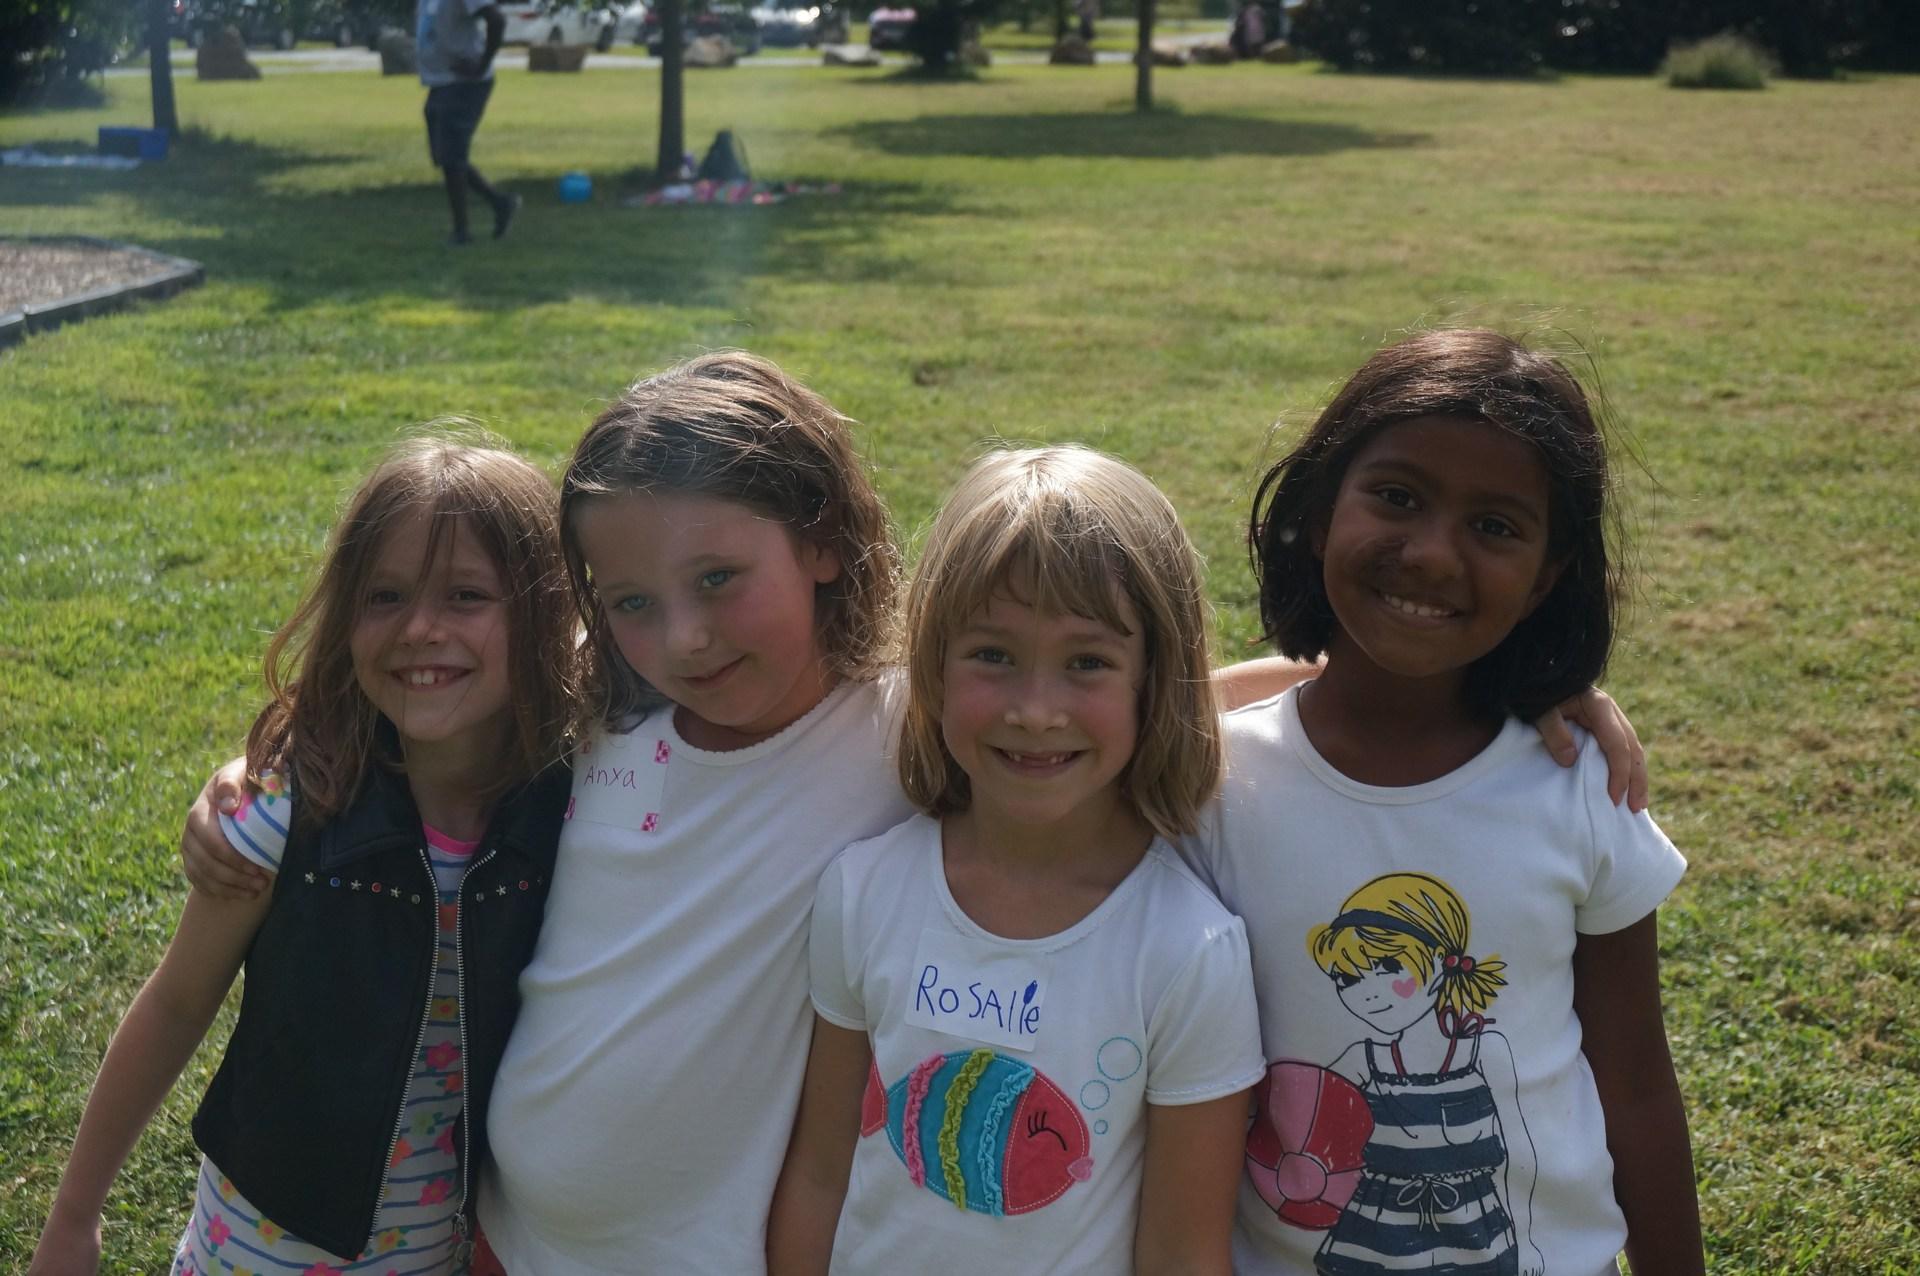 Lower El girls at picnic